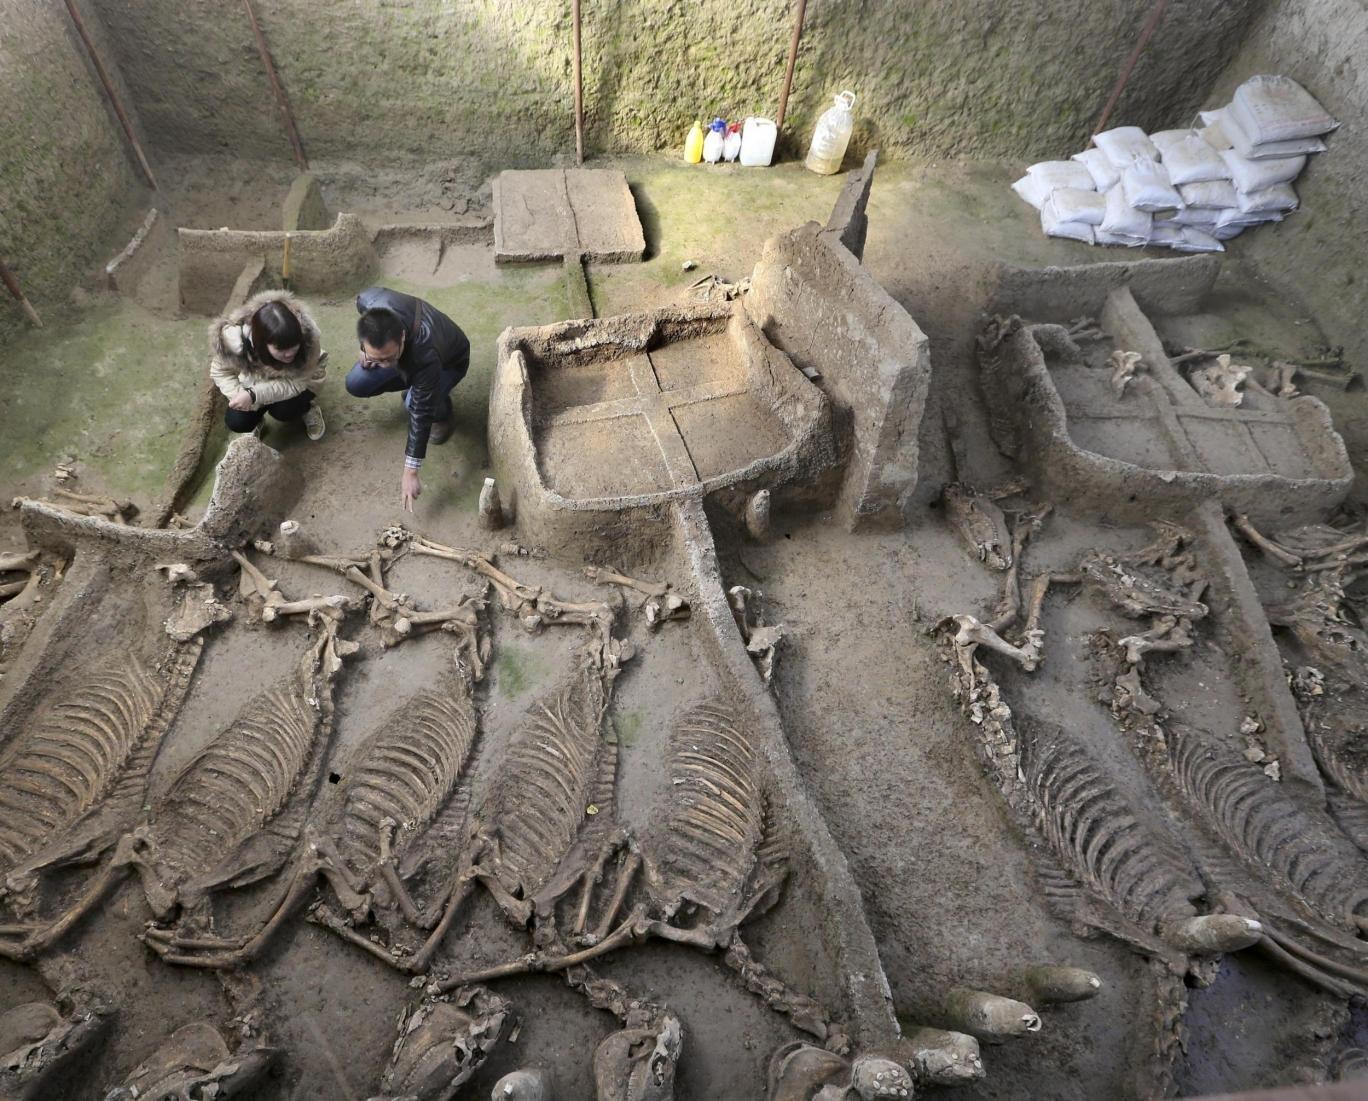 2500 Jaar Oude Chinese Graftombe Gevonden Geheime